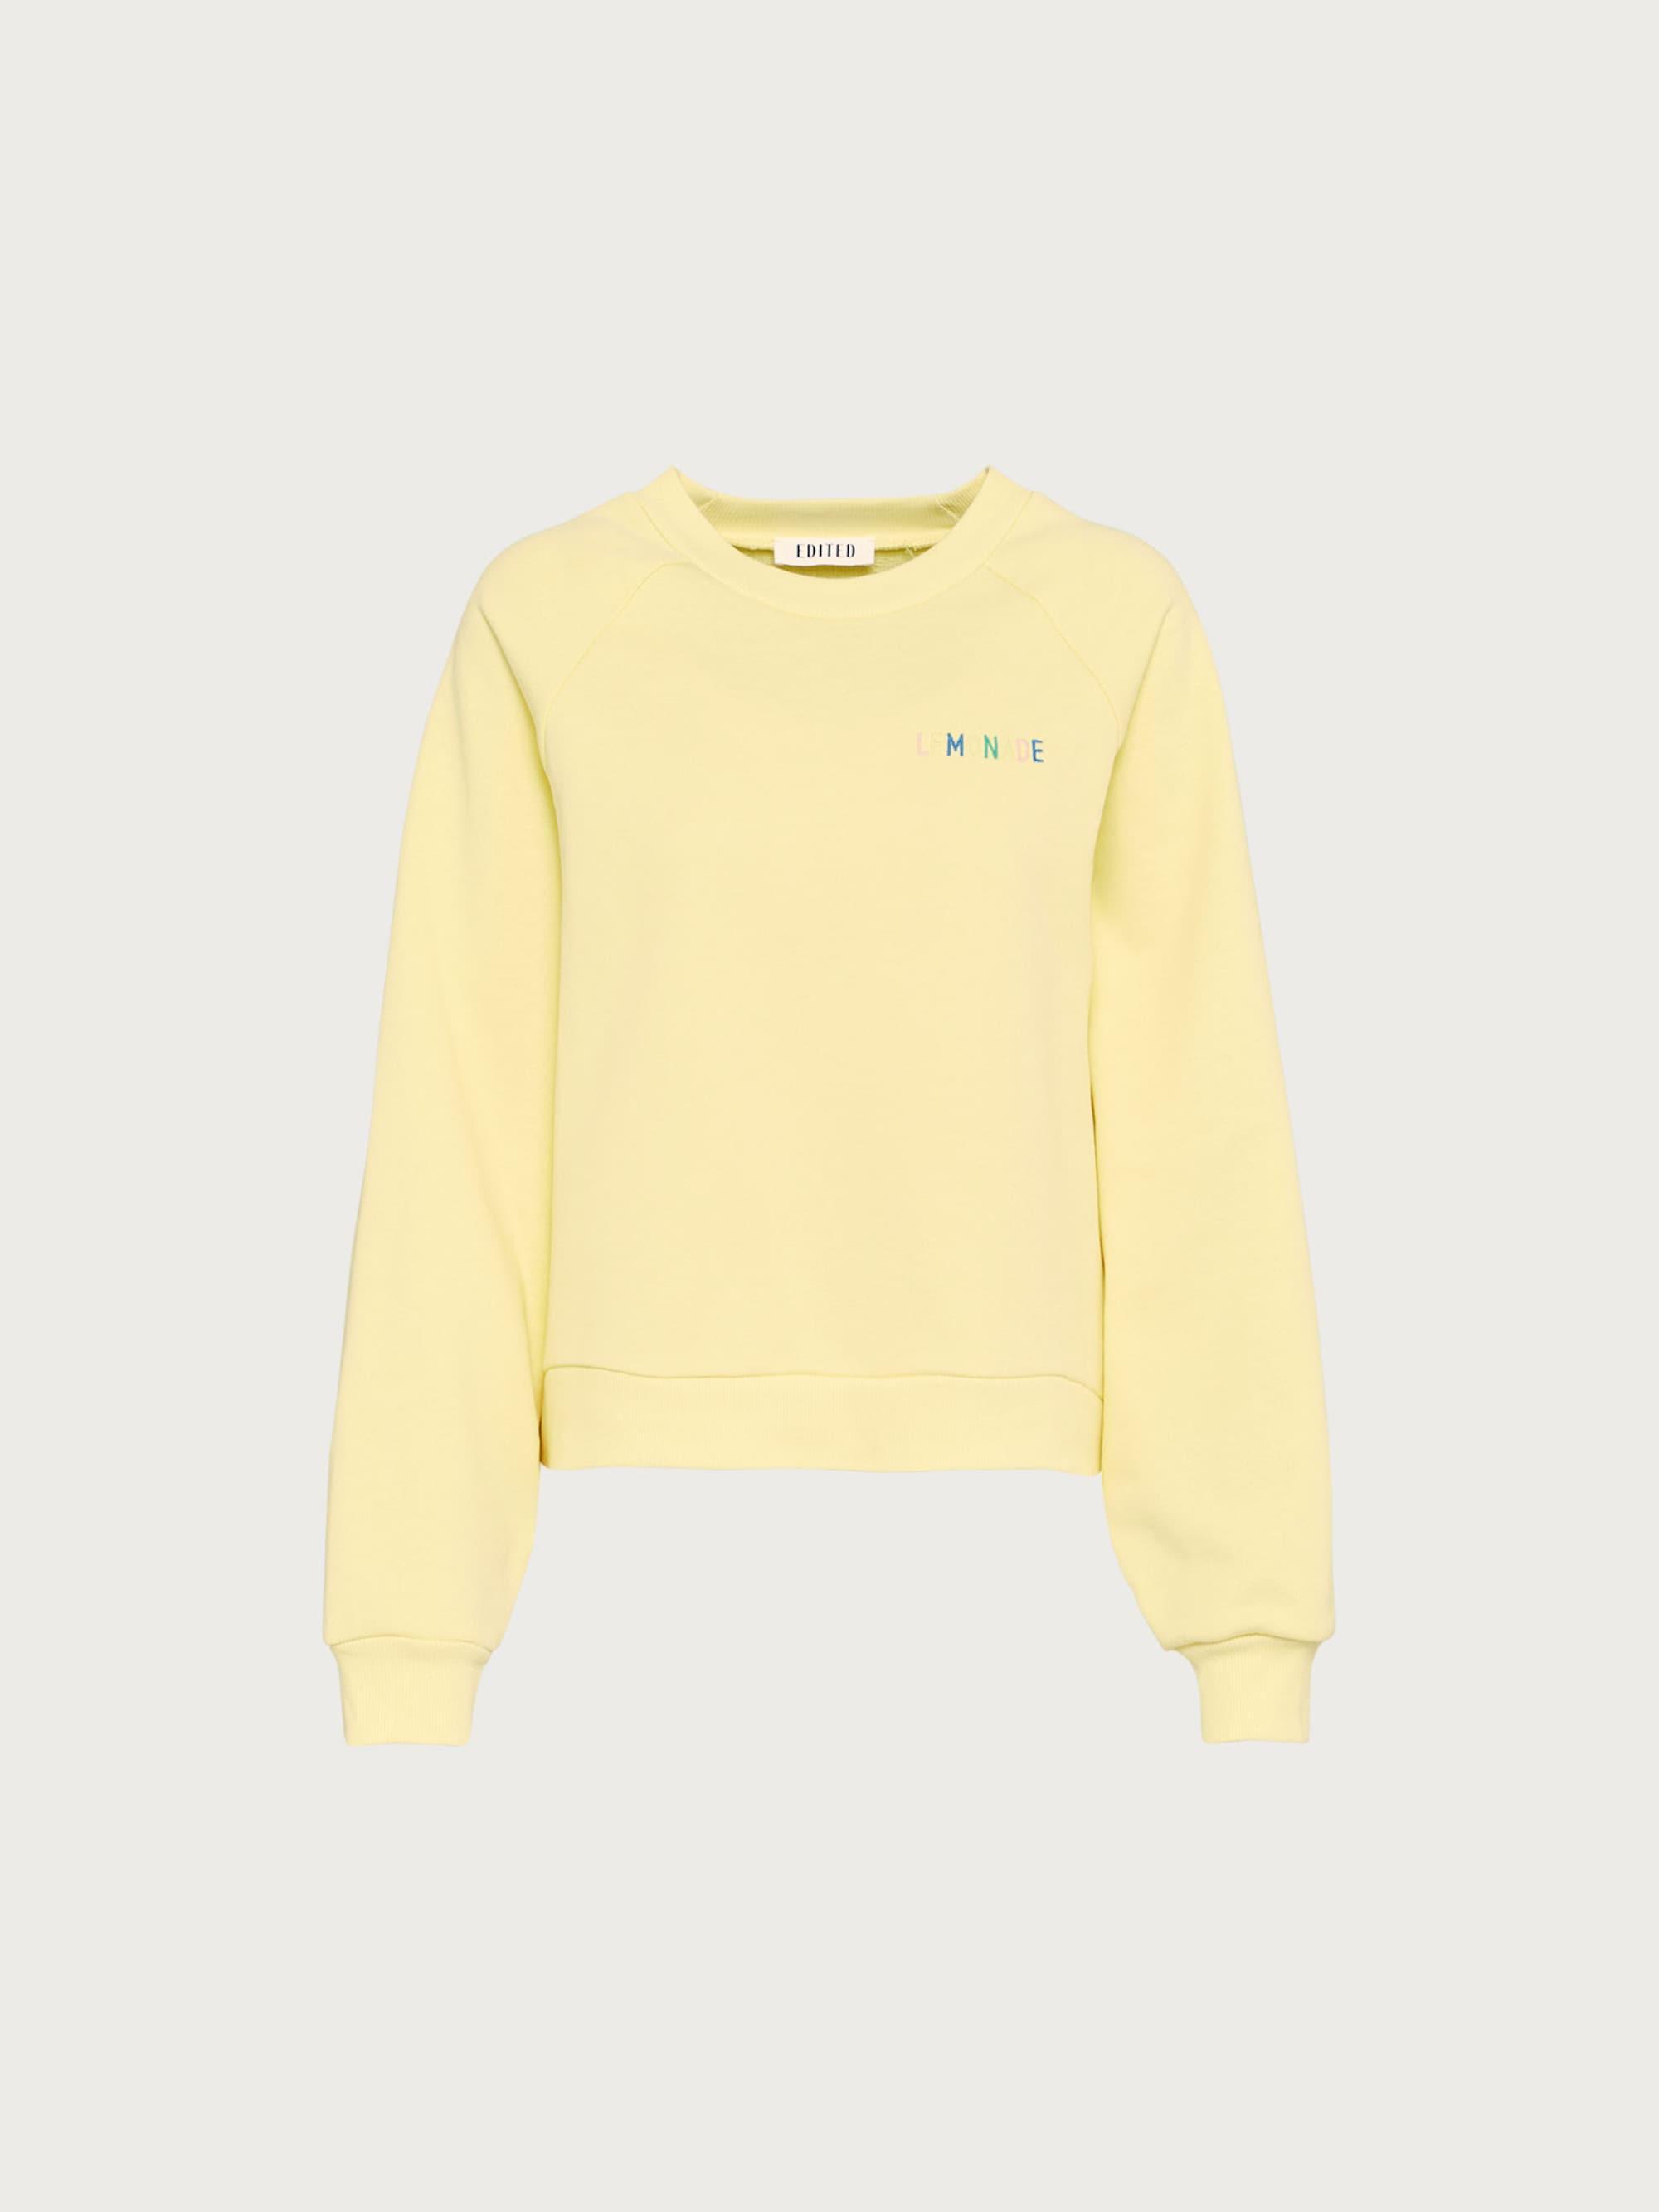 edited - Sweatshirt ´Stine´